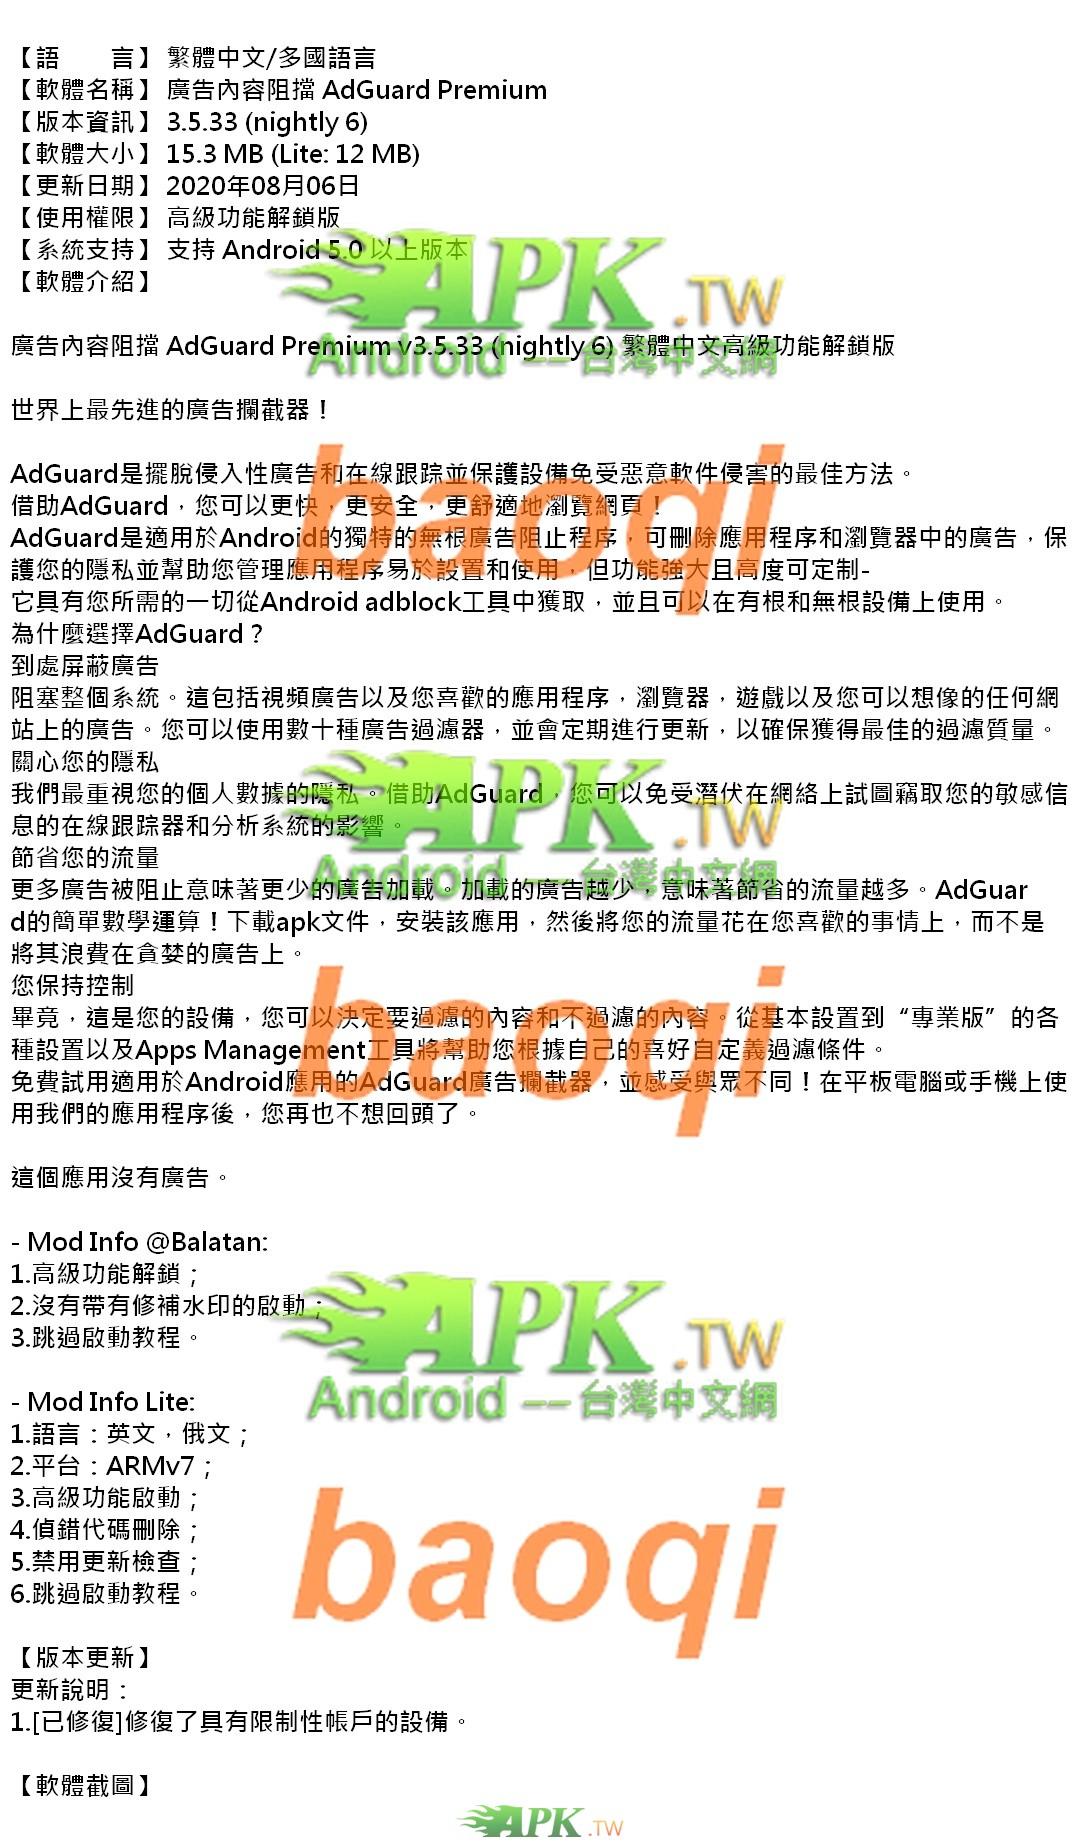 AdGuard_Premium_3.5.33_nightly6_.jpg